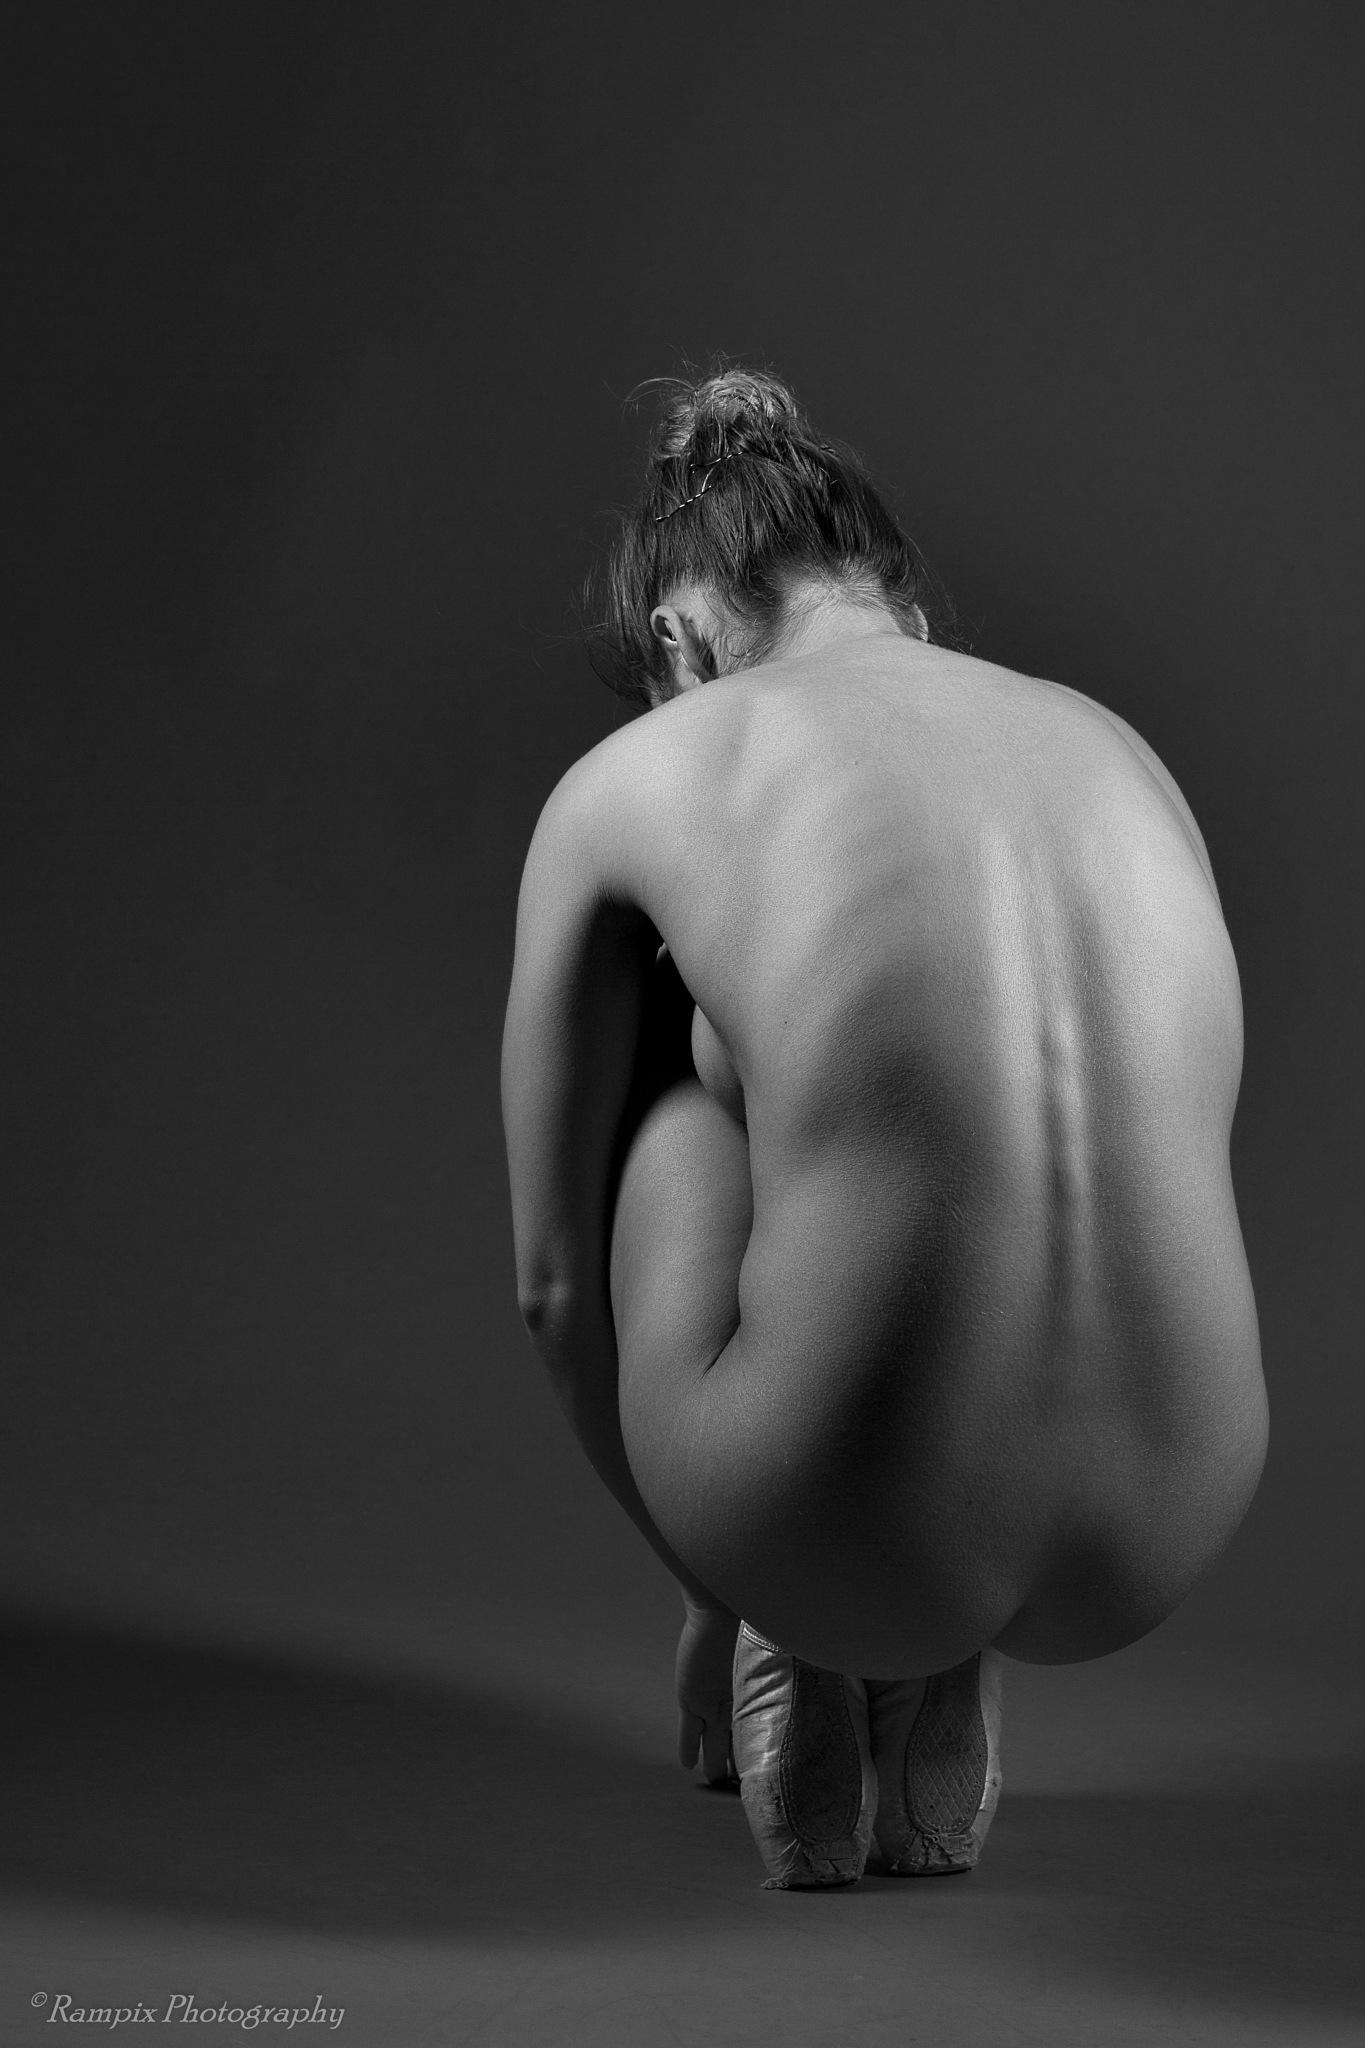 Rachelle Summers by Rampix